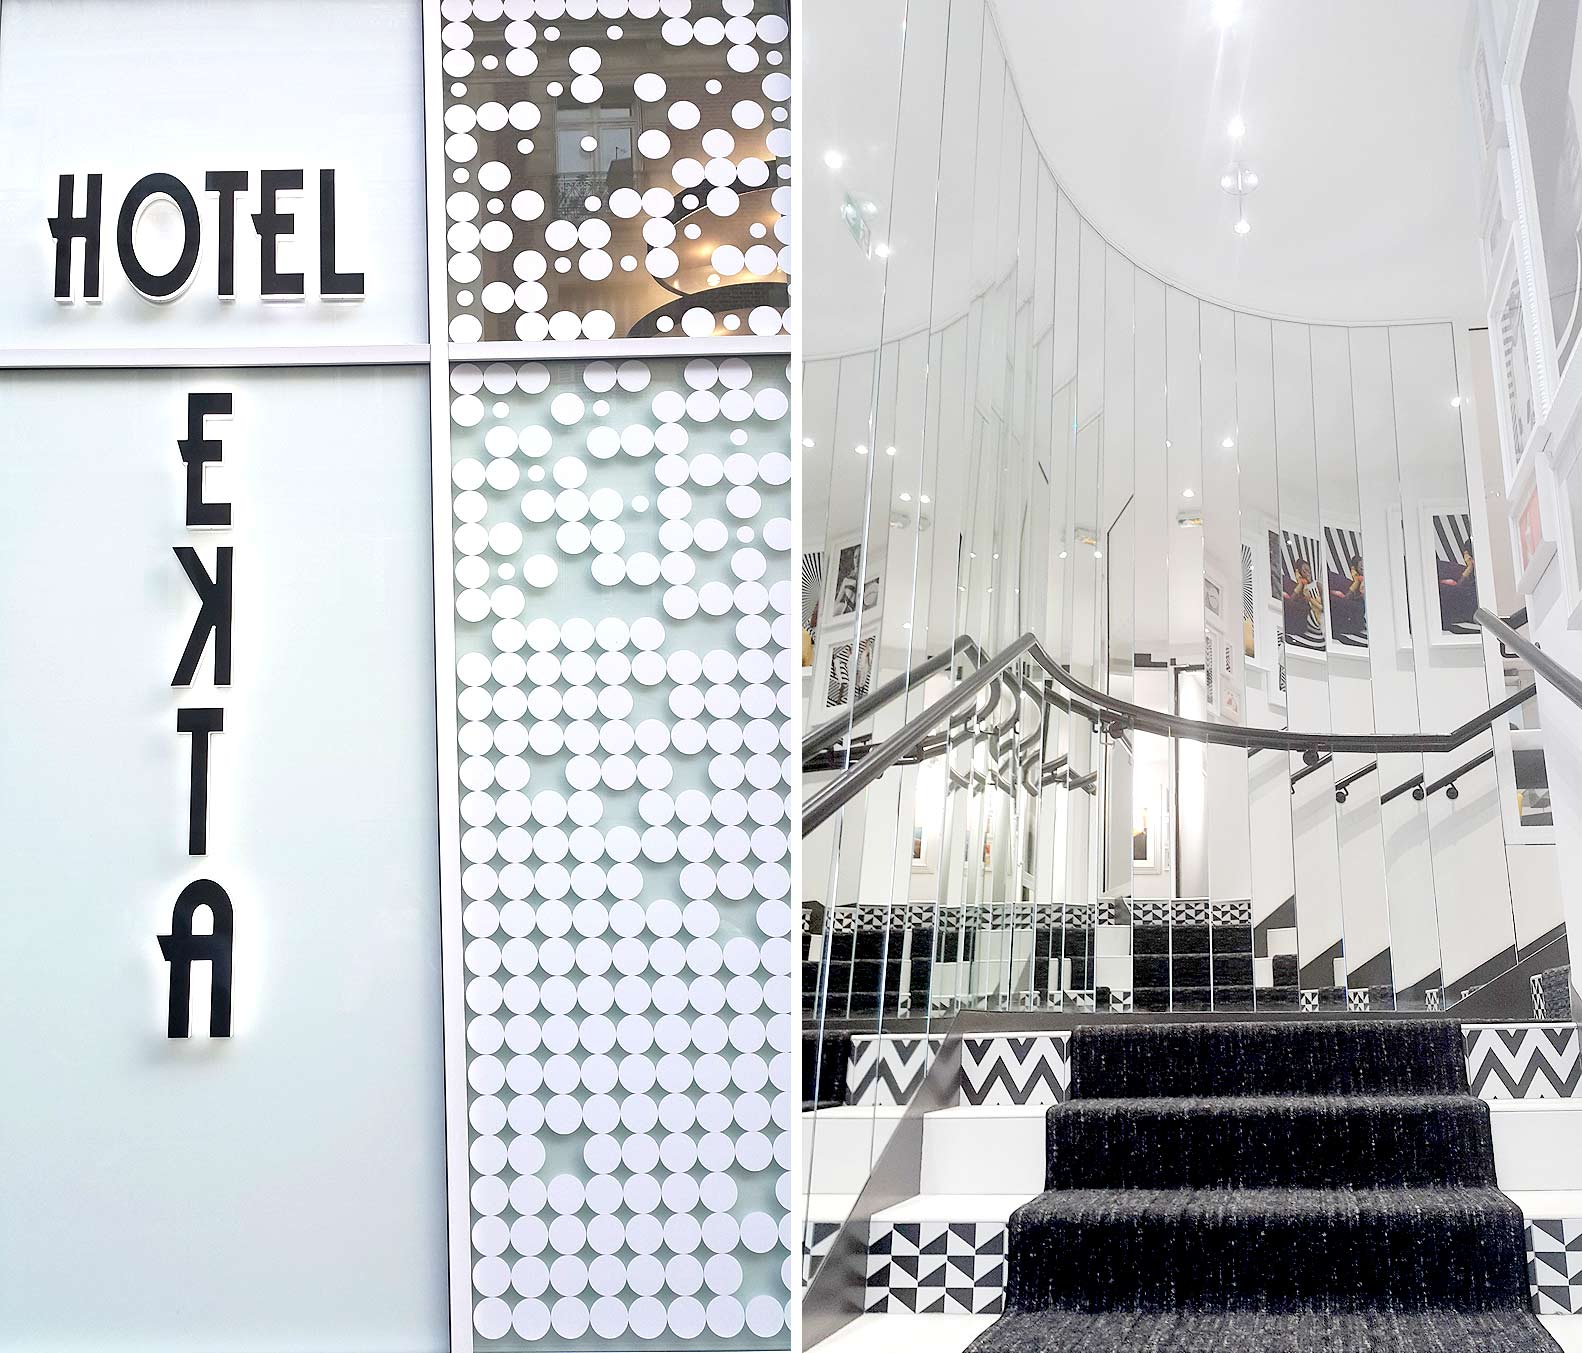 hotel-ekta-01